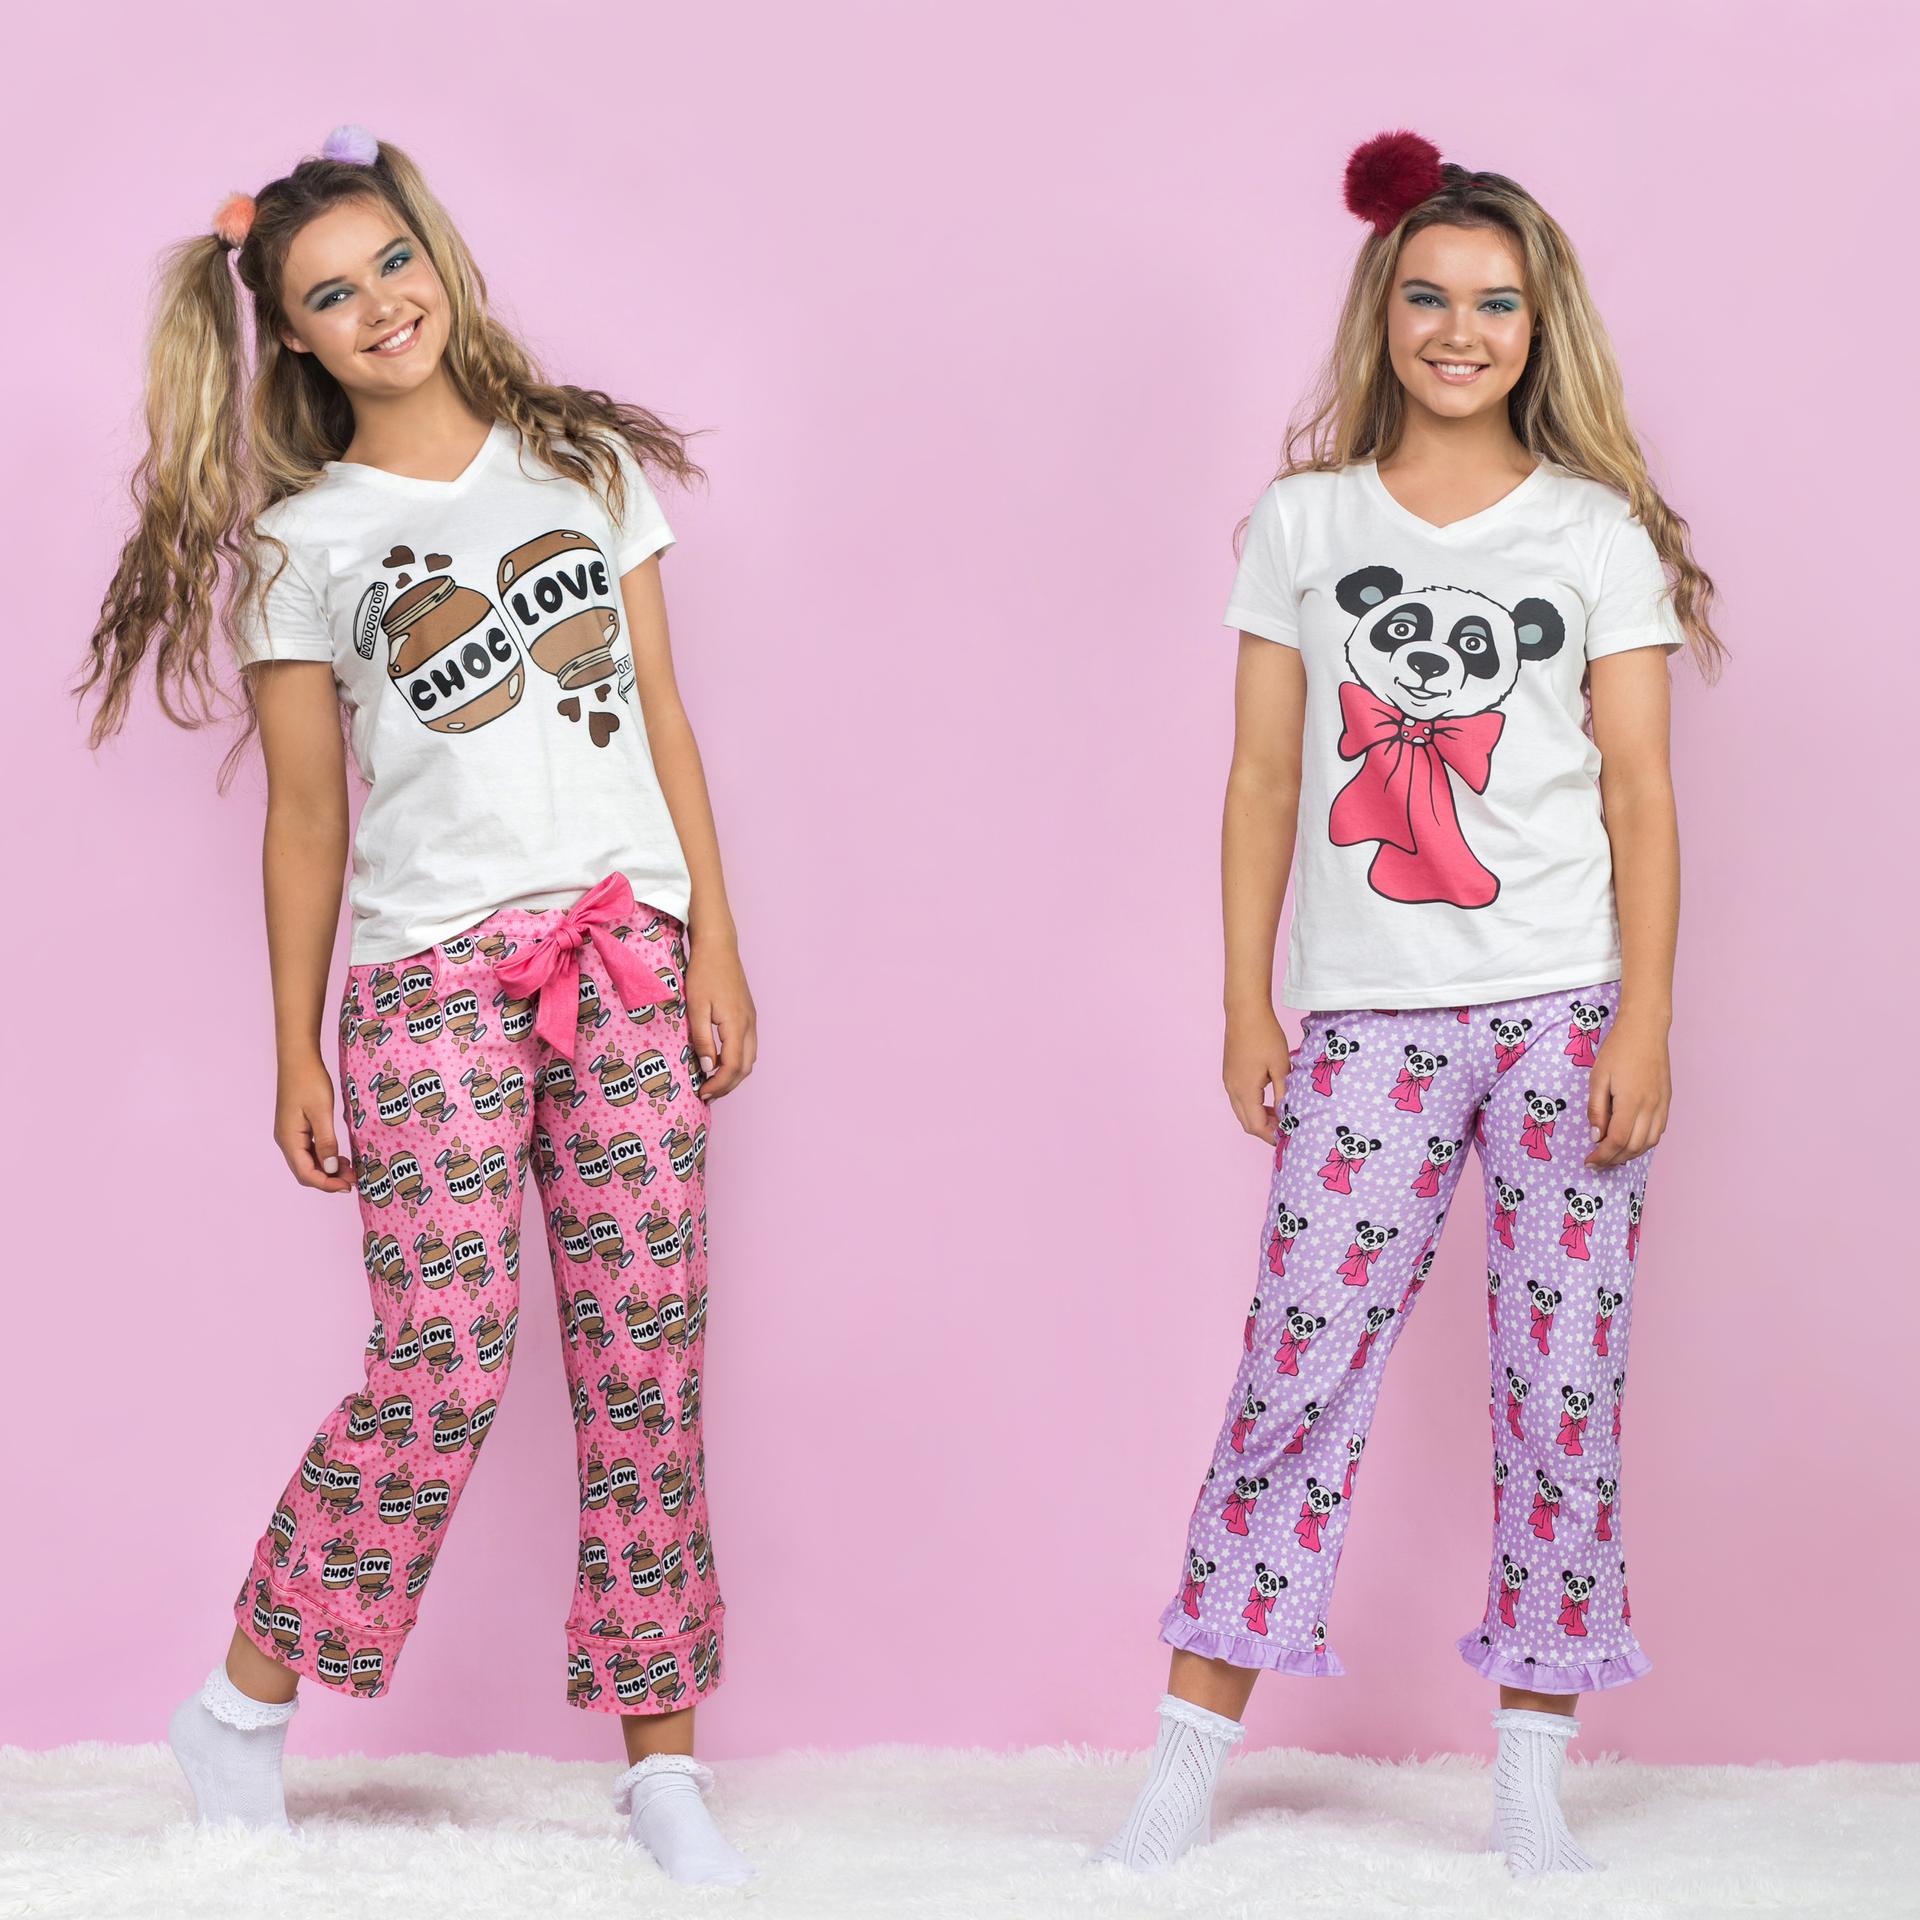 Sam K Ryan Sleepwear & Textile Designs